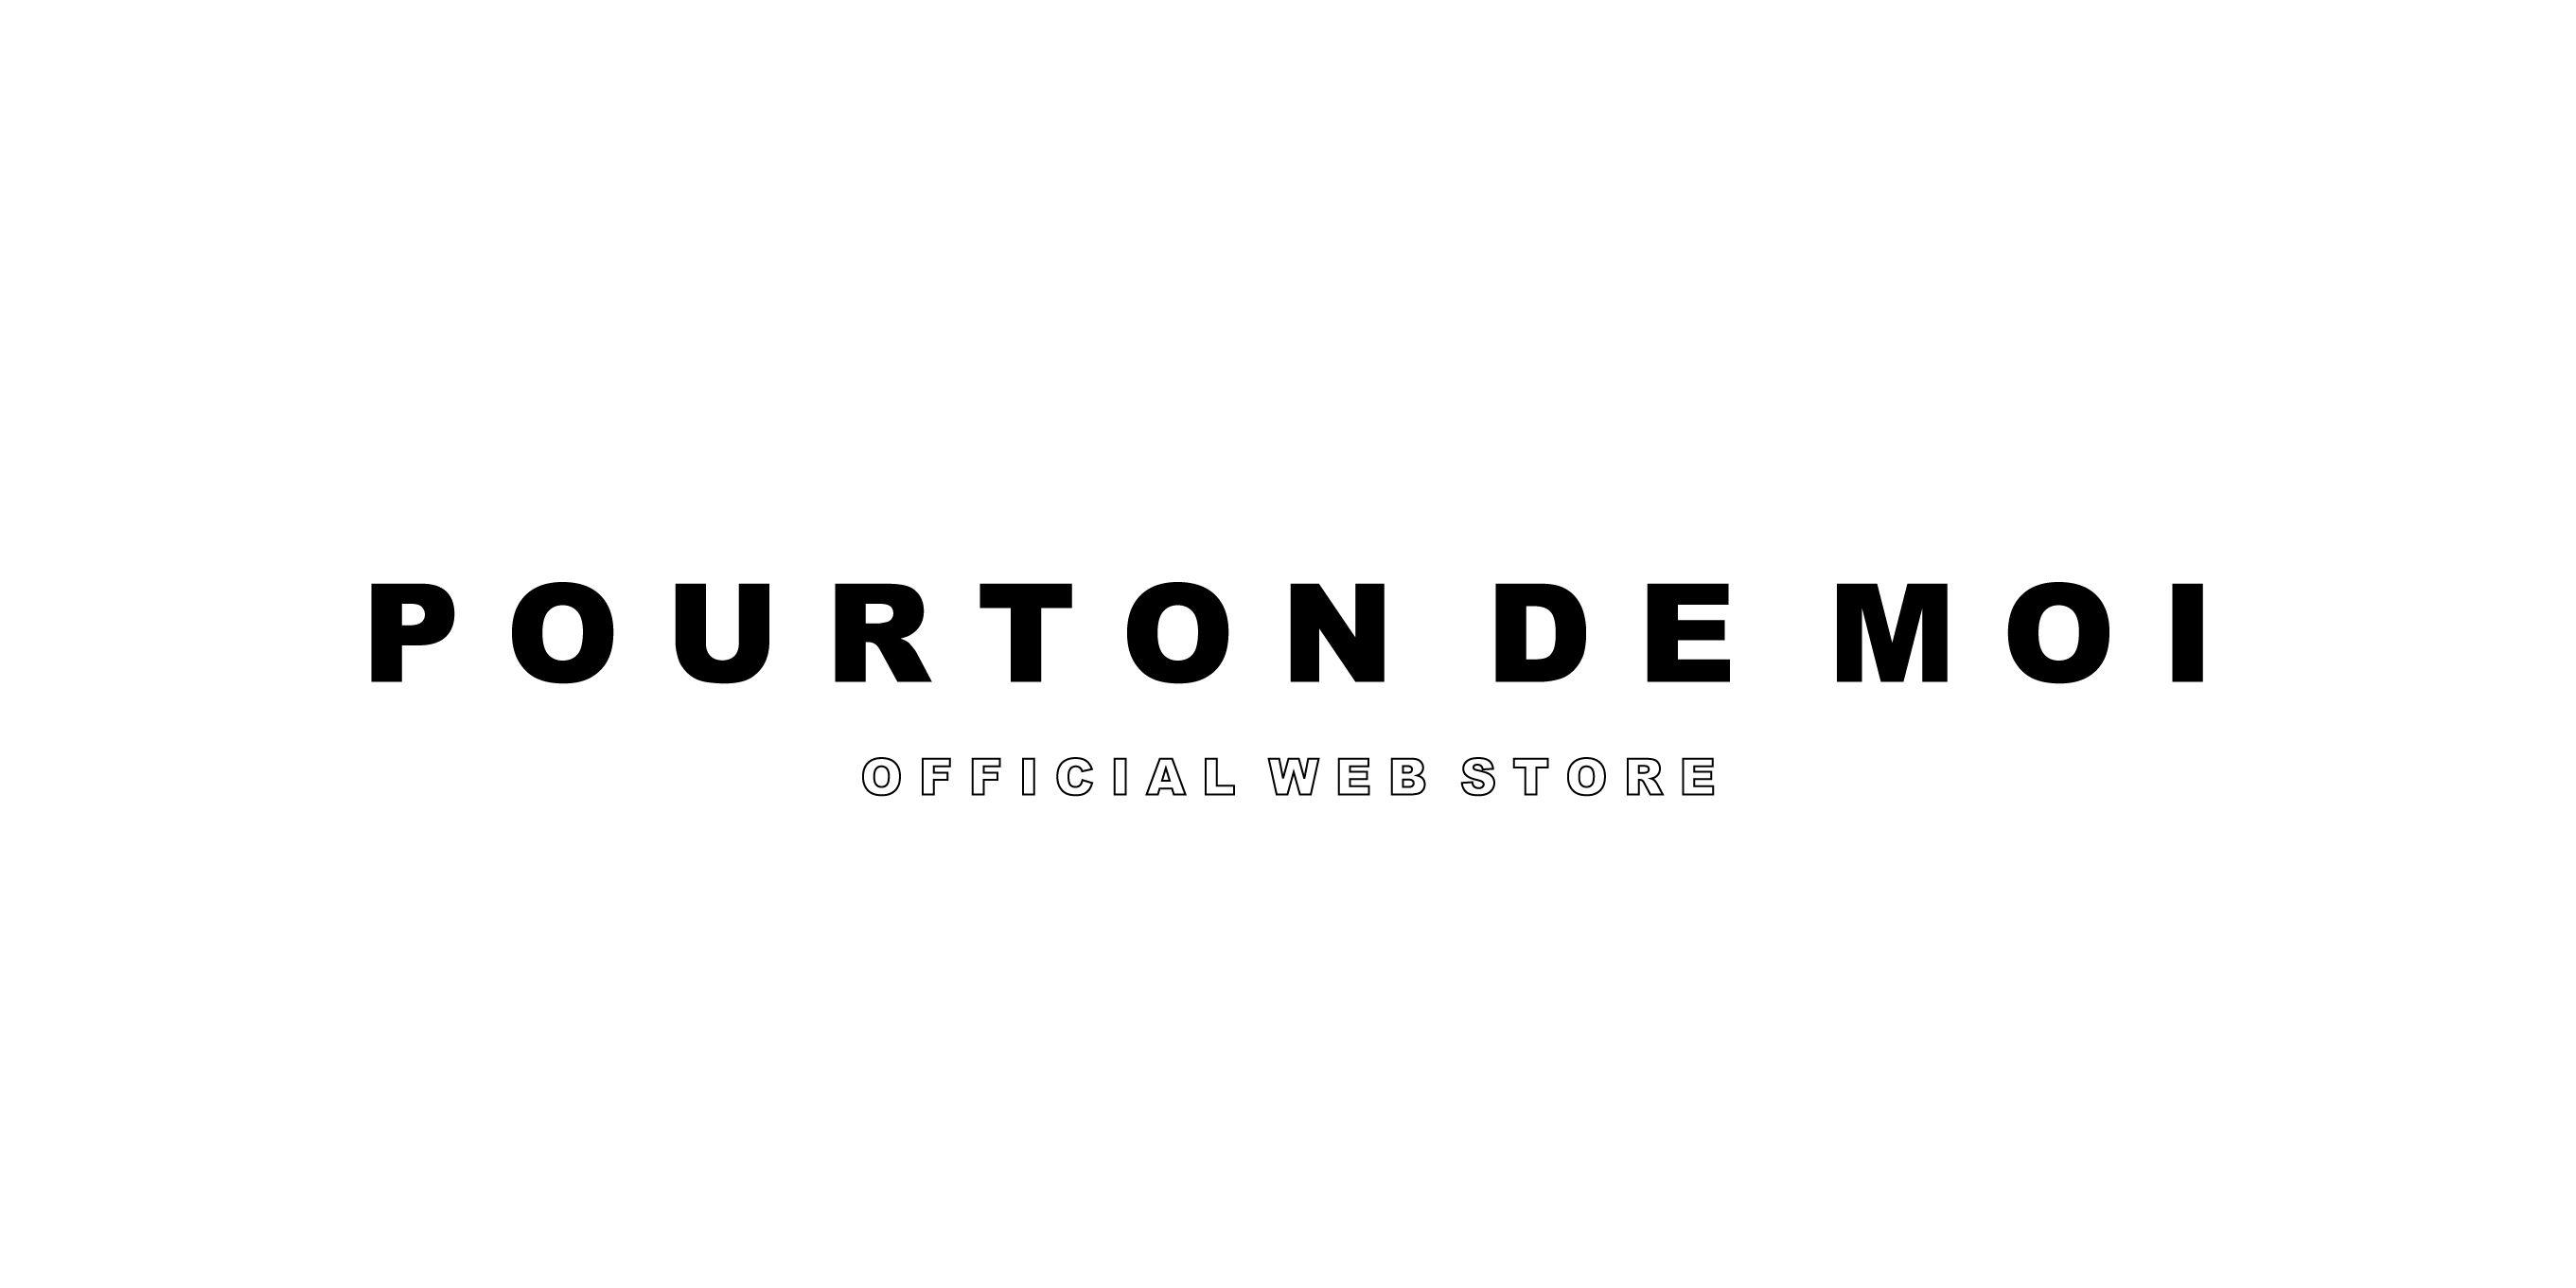 POURTON DE MOI    WEB  STORE